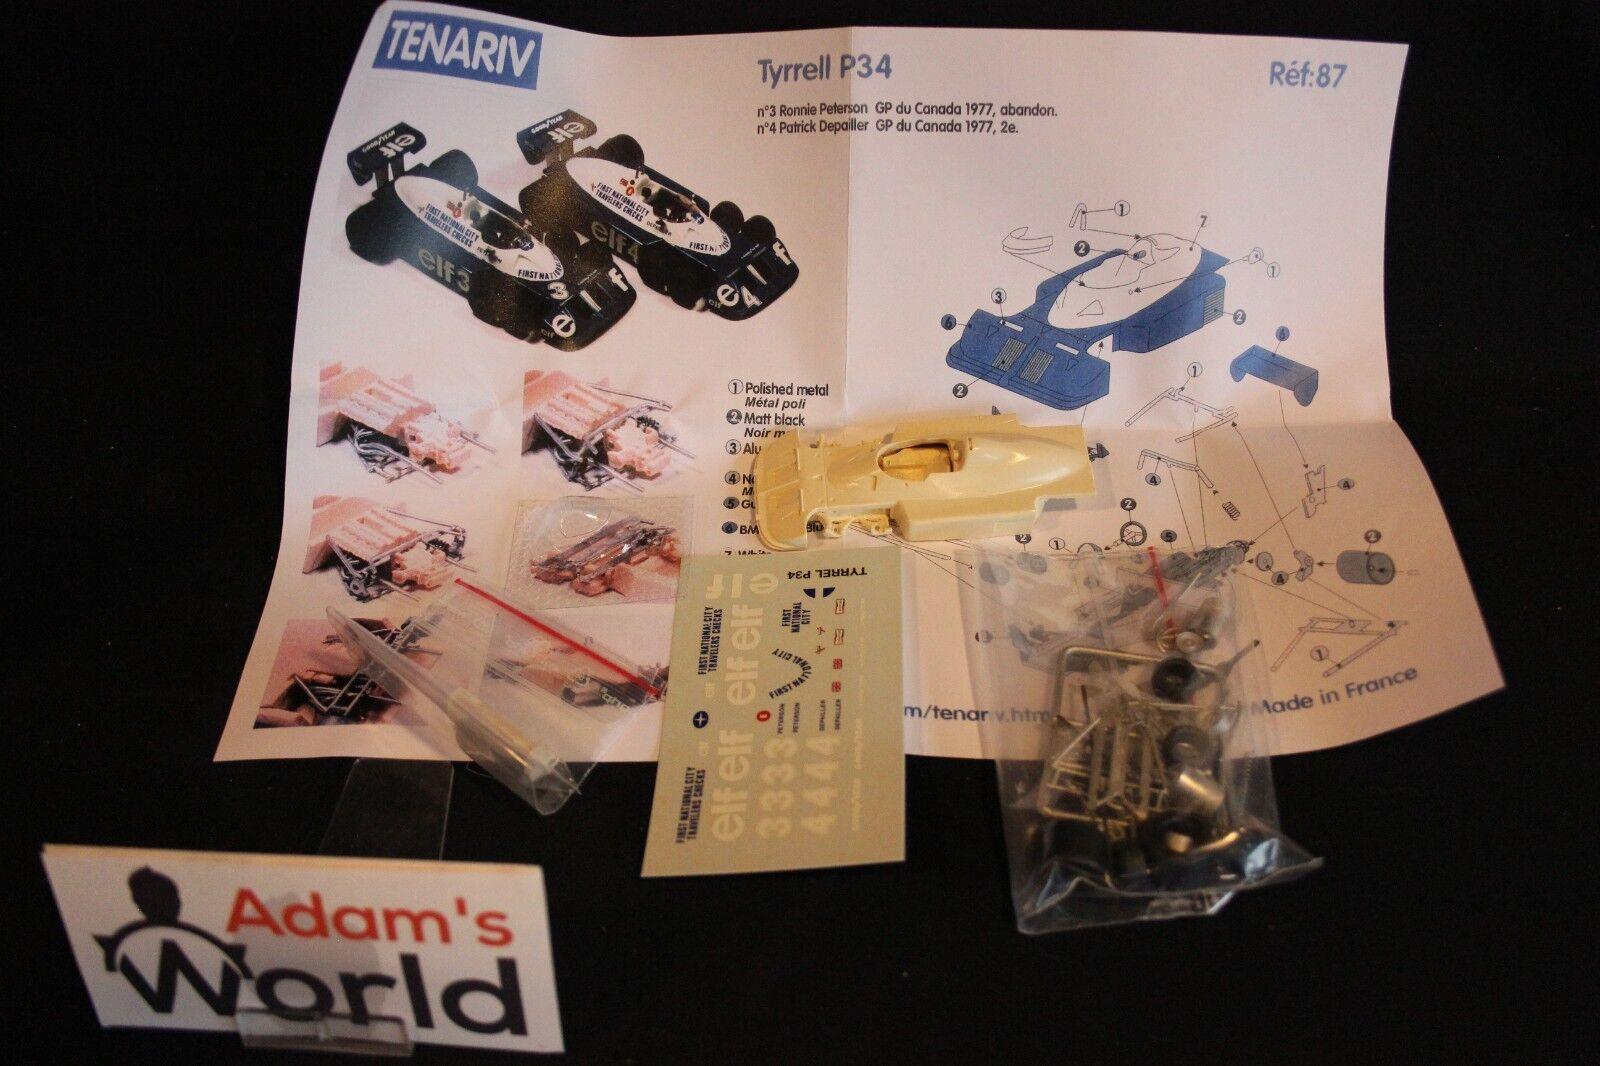 Tenariv Tenariv Tenariv kit Tyrrell Ford P34 1977 1 43  3    4 Peterson   Depailler GP CAN 7dc820